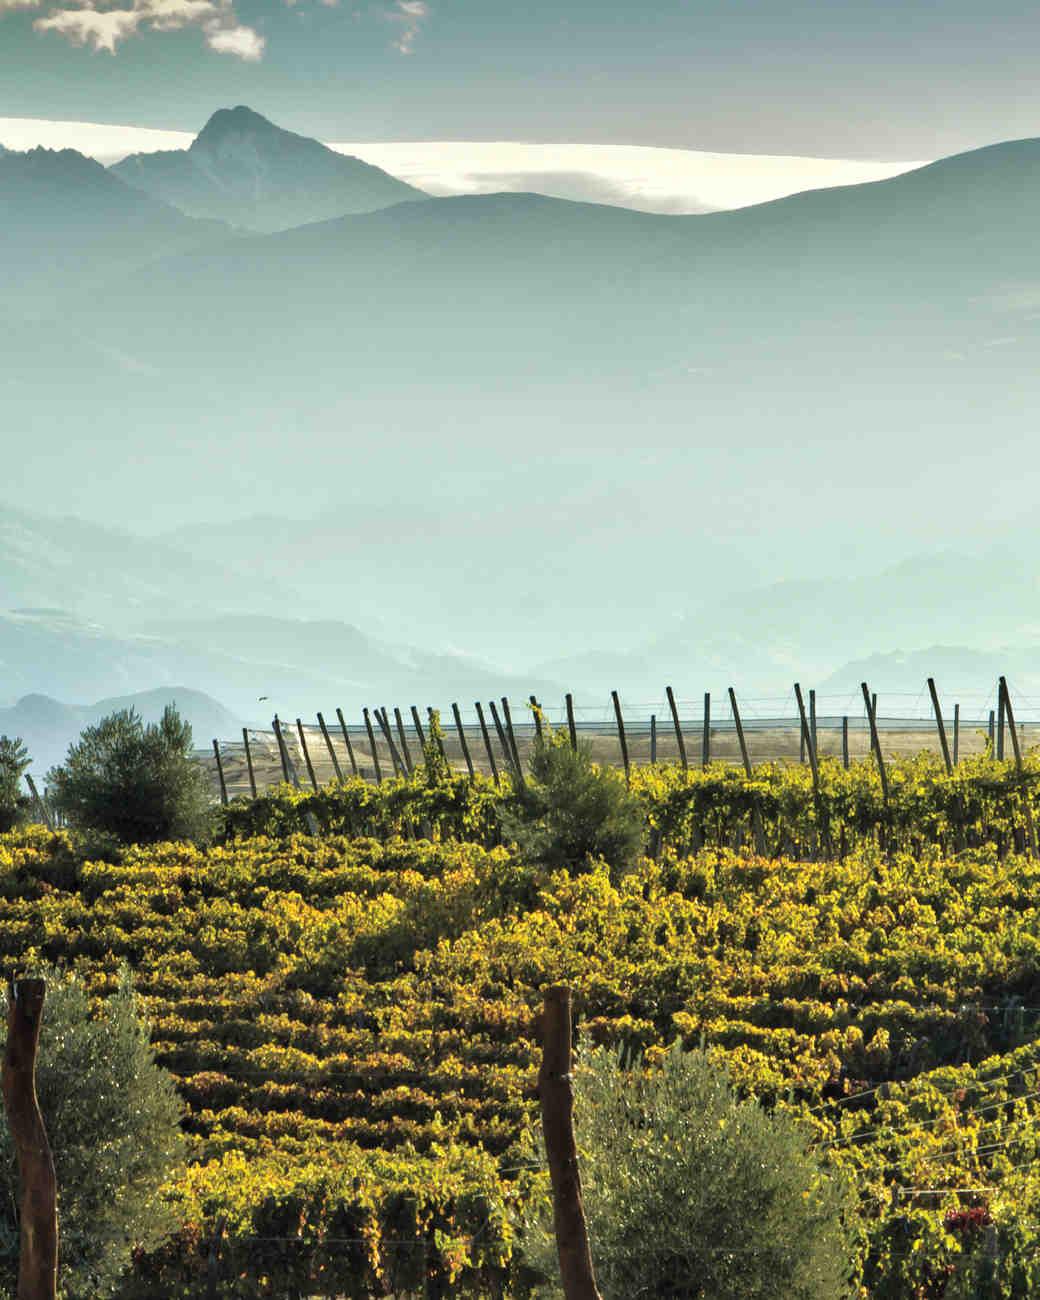 vineyard-istock-000043735518-large-s112566.jpg